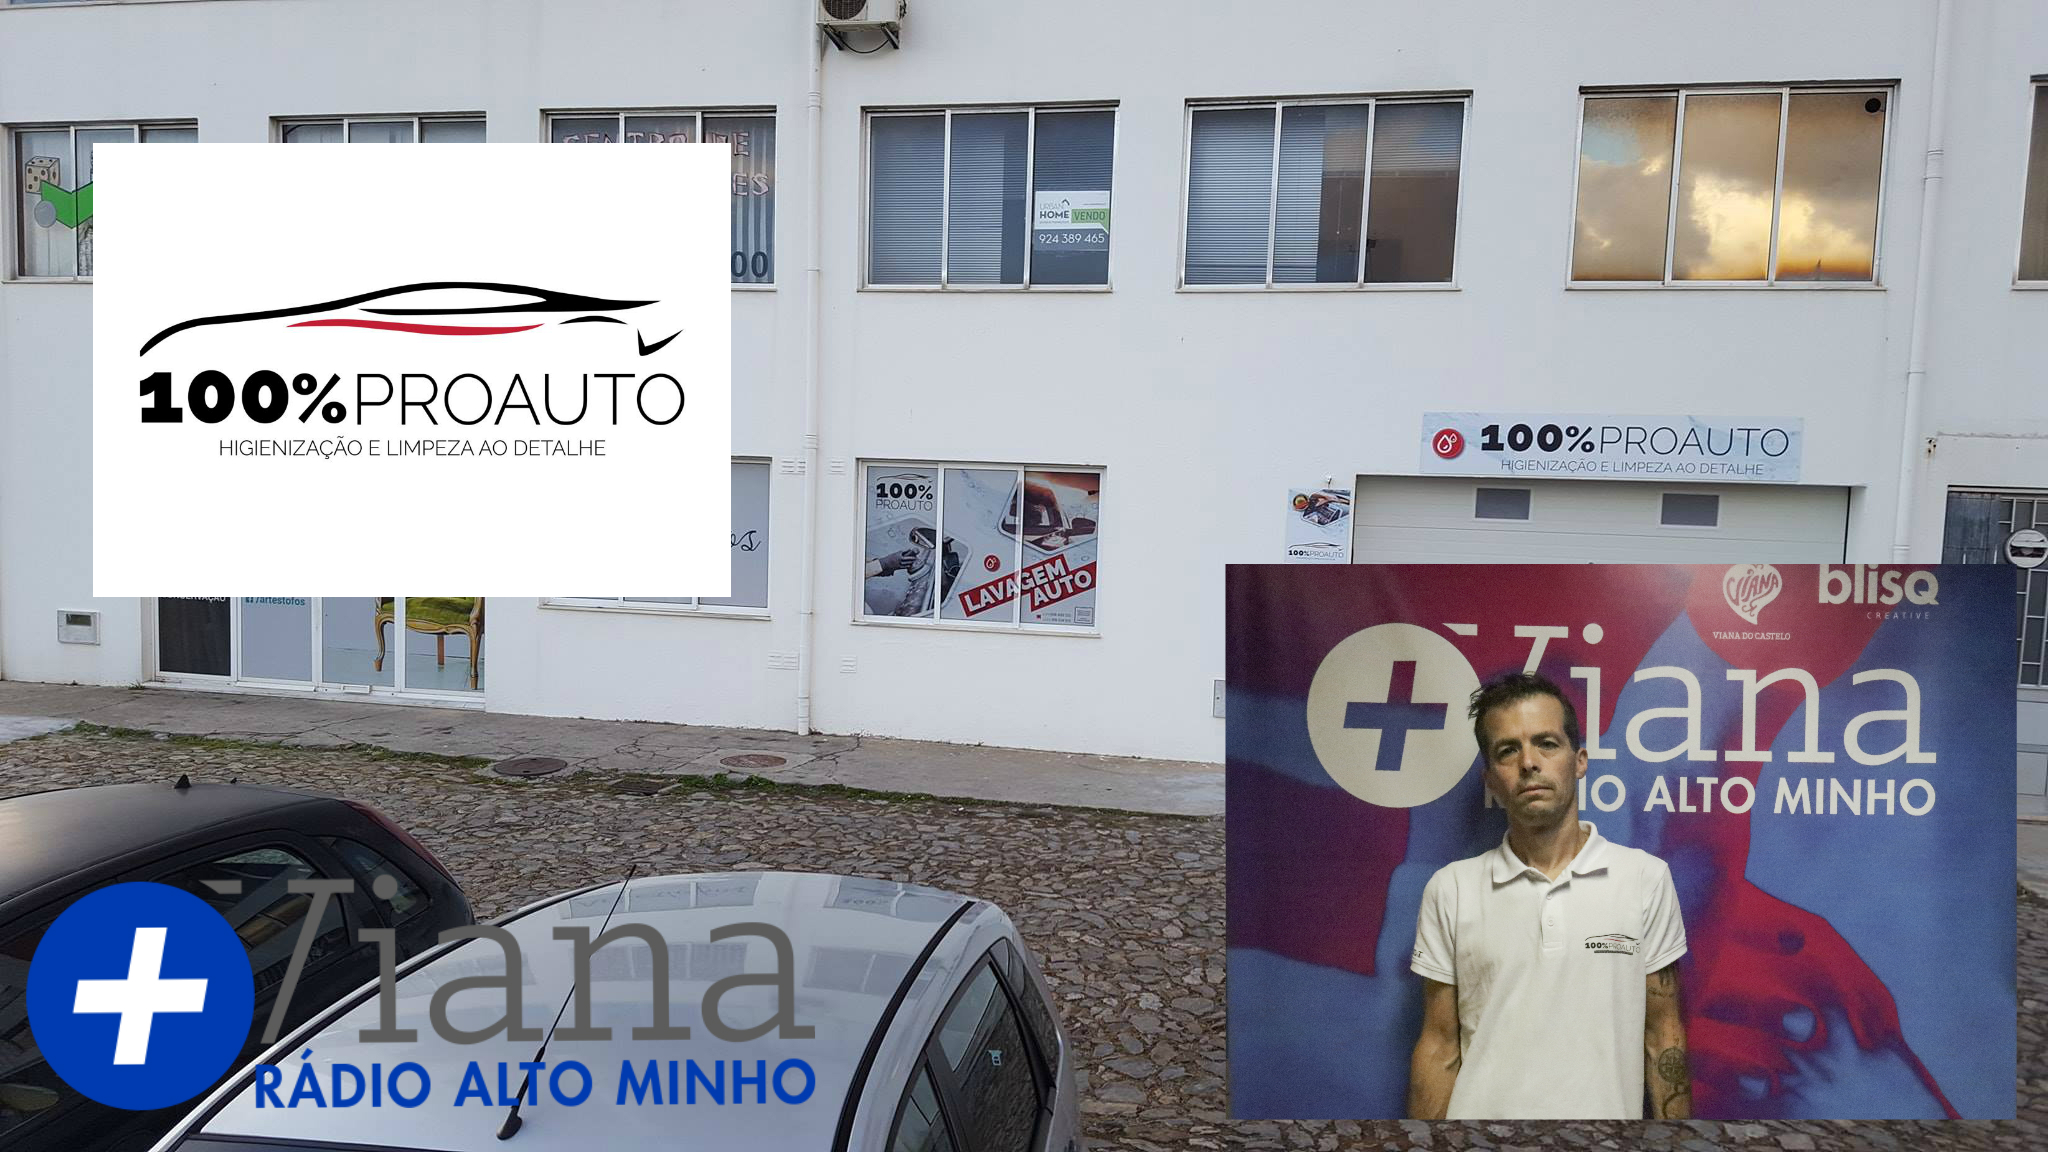 +Viana: 100% ProAuto